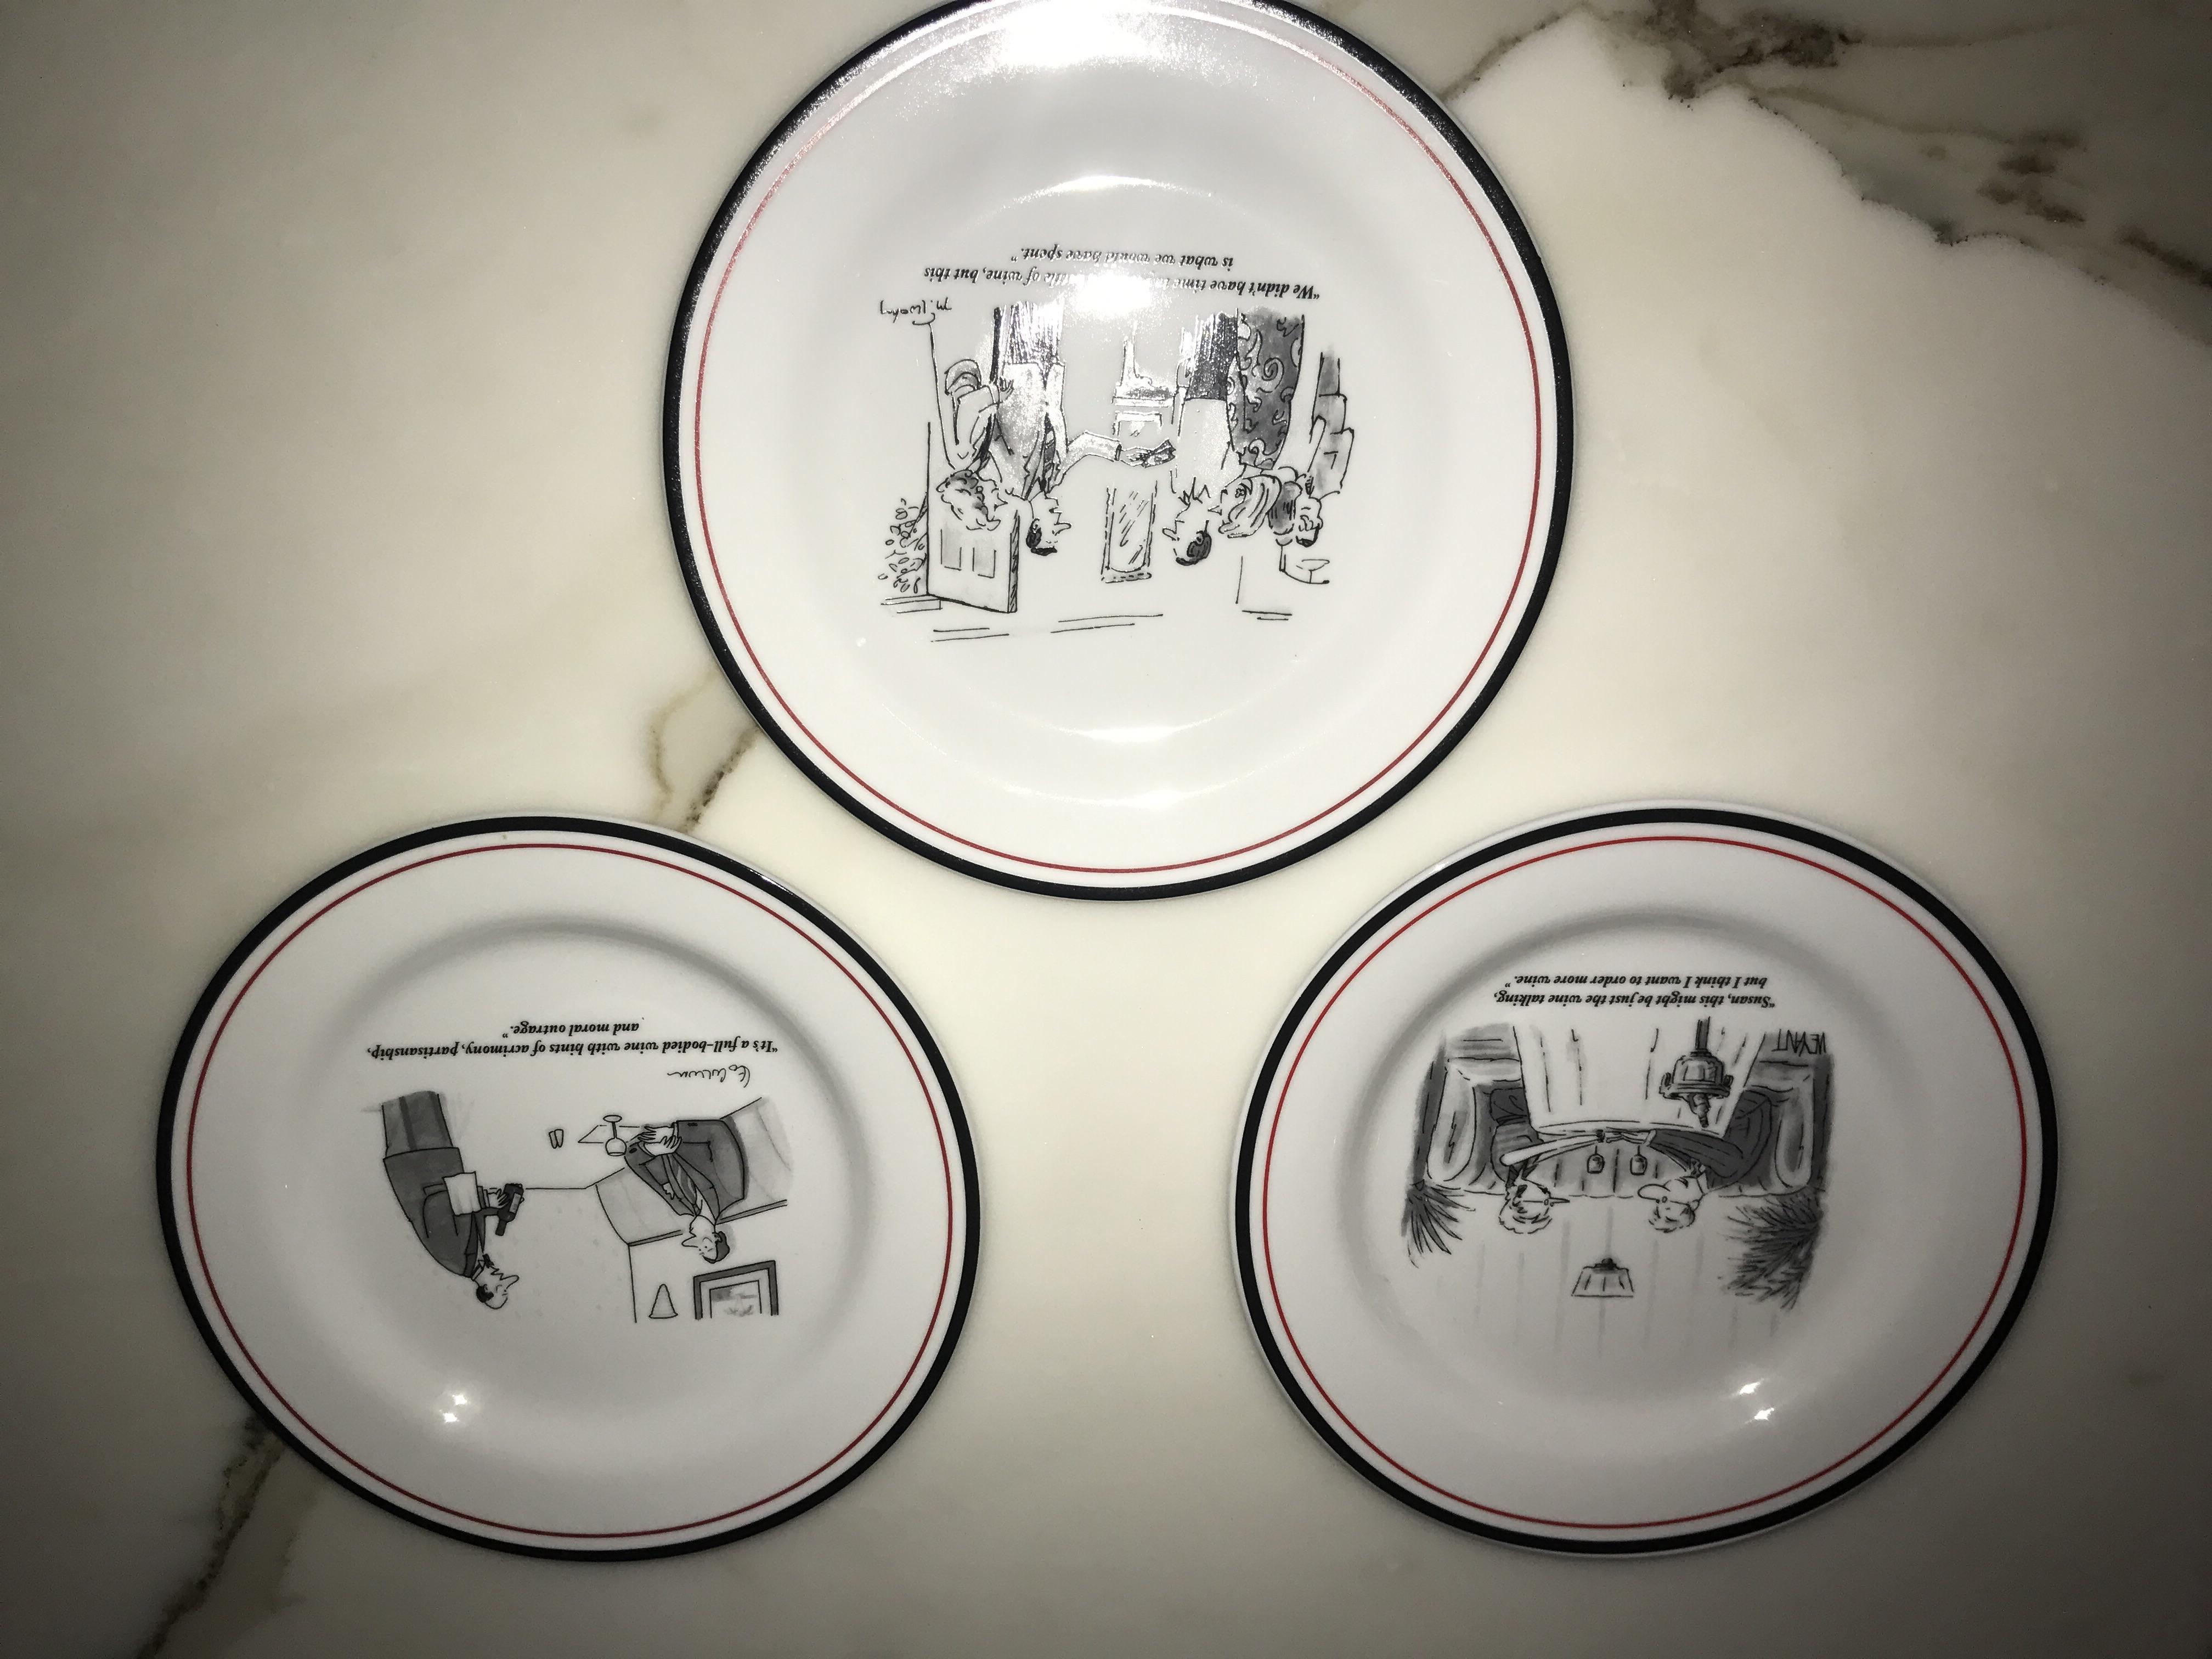 Restoration Hardware The New Yorker Cheese Plates - Set of 6 - Image 3 of 7  sc 1 st  Chairish & Restoration Hardware The New Yorker Cheese Plates - Set of 6 | Chairish